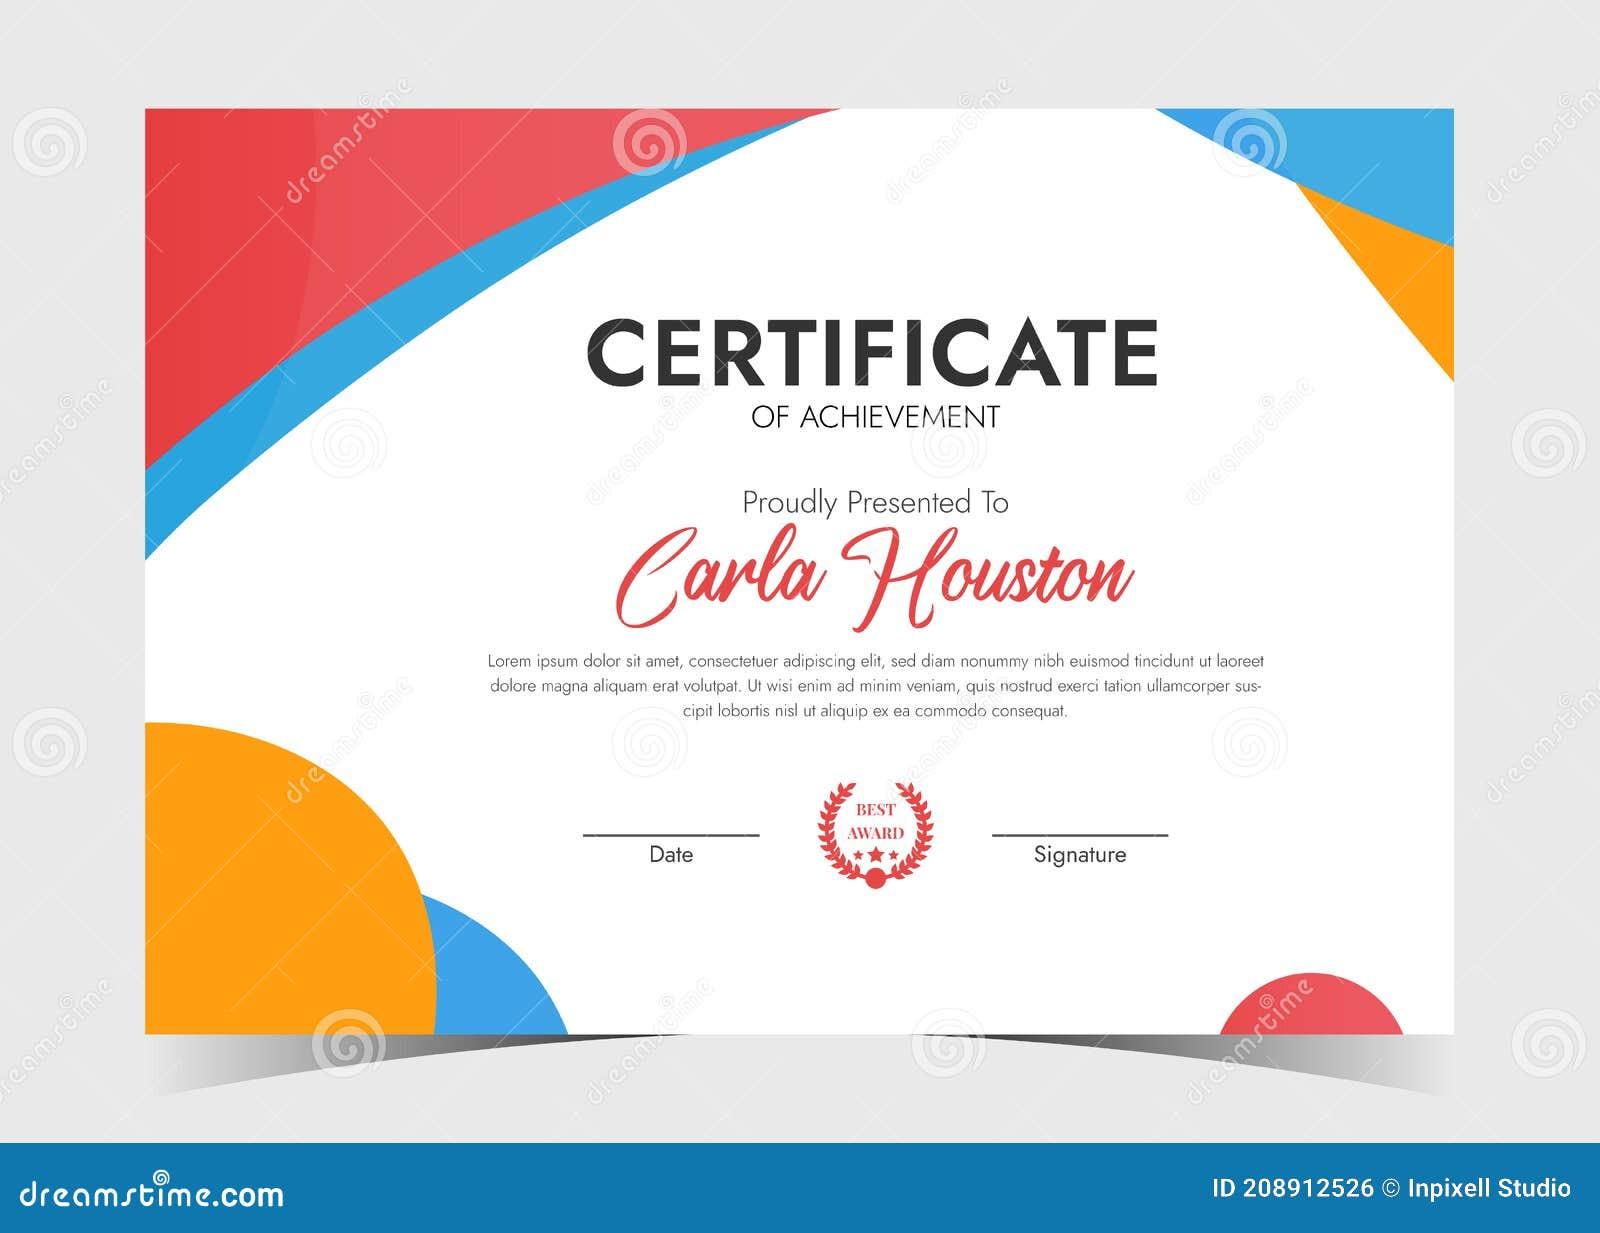 Certificate Template Awards Diploma. Minimalist Certificate With Regard To Professional Award Certificate Template